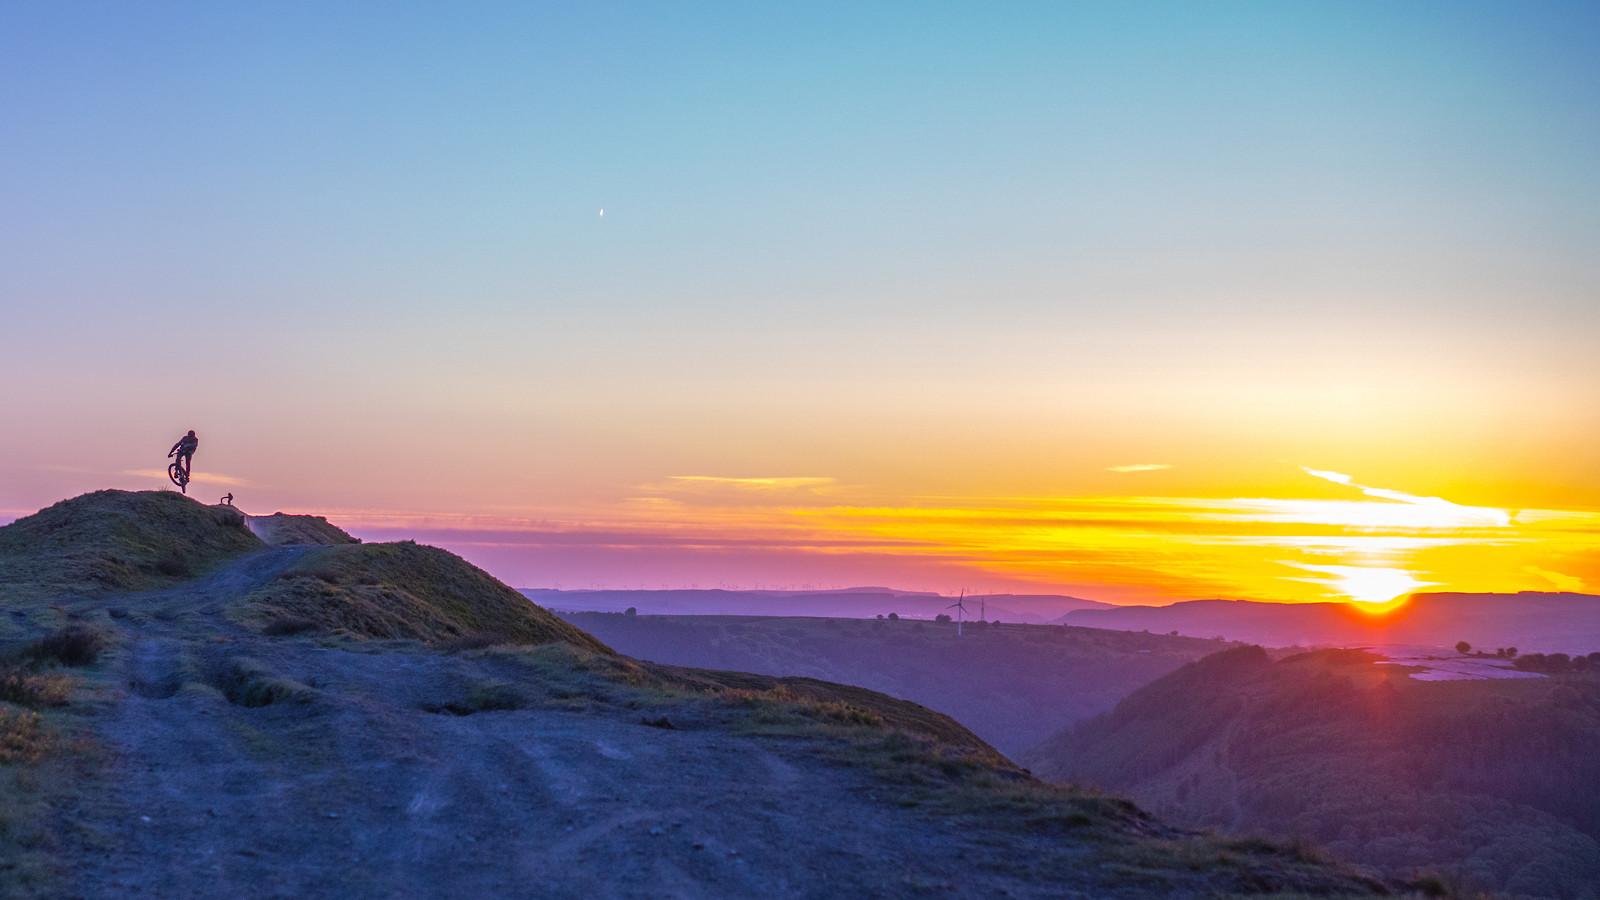 Pez  - Matthew Davies - Mountain Biking Pictures - Vital MTB